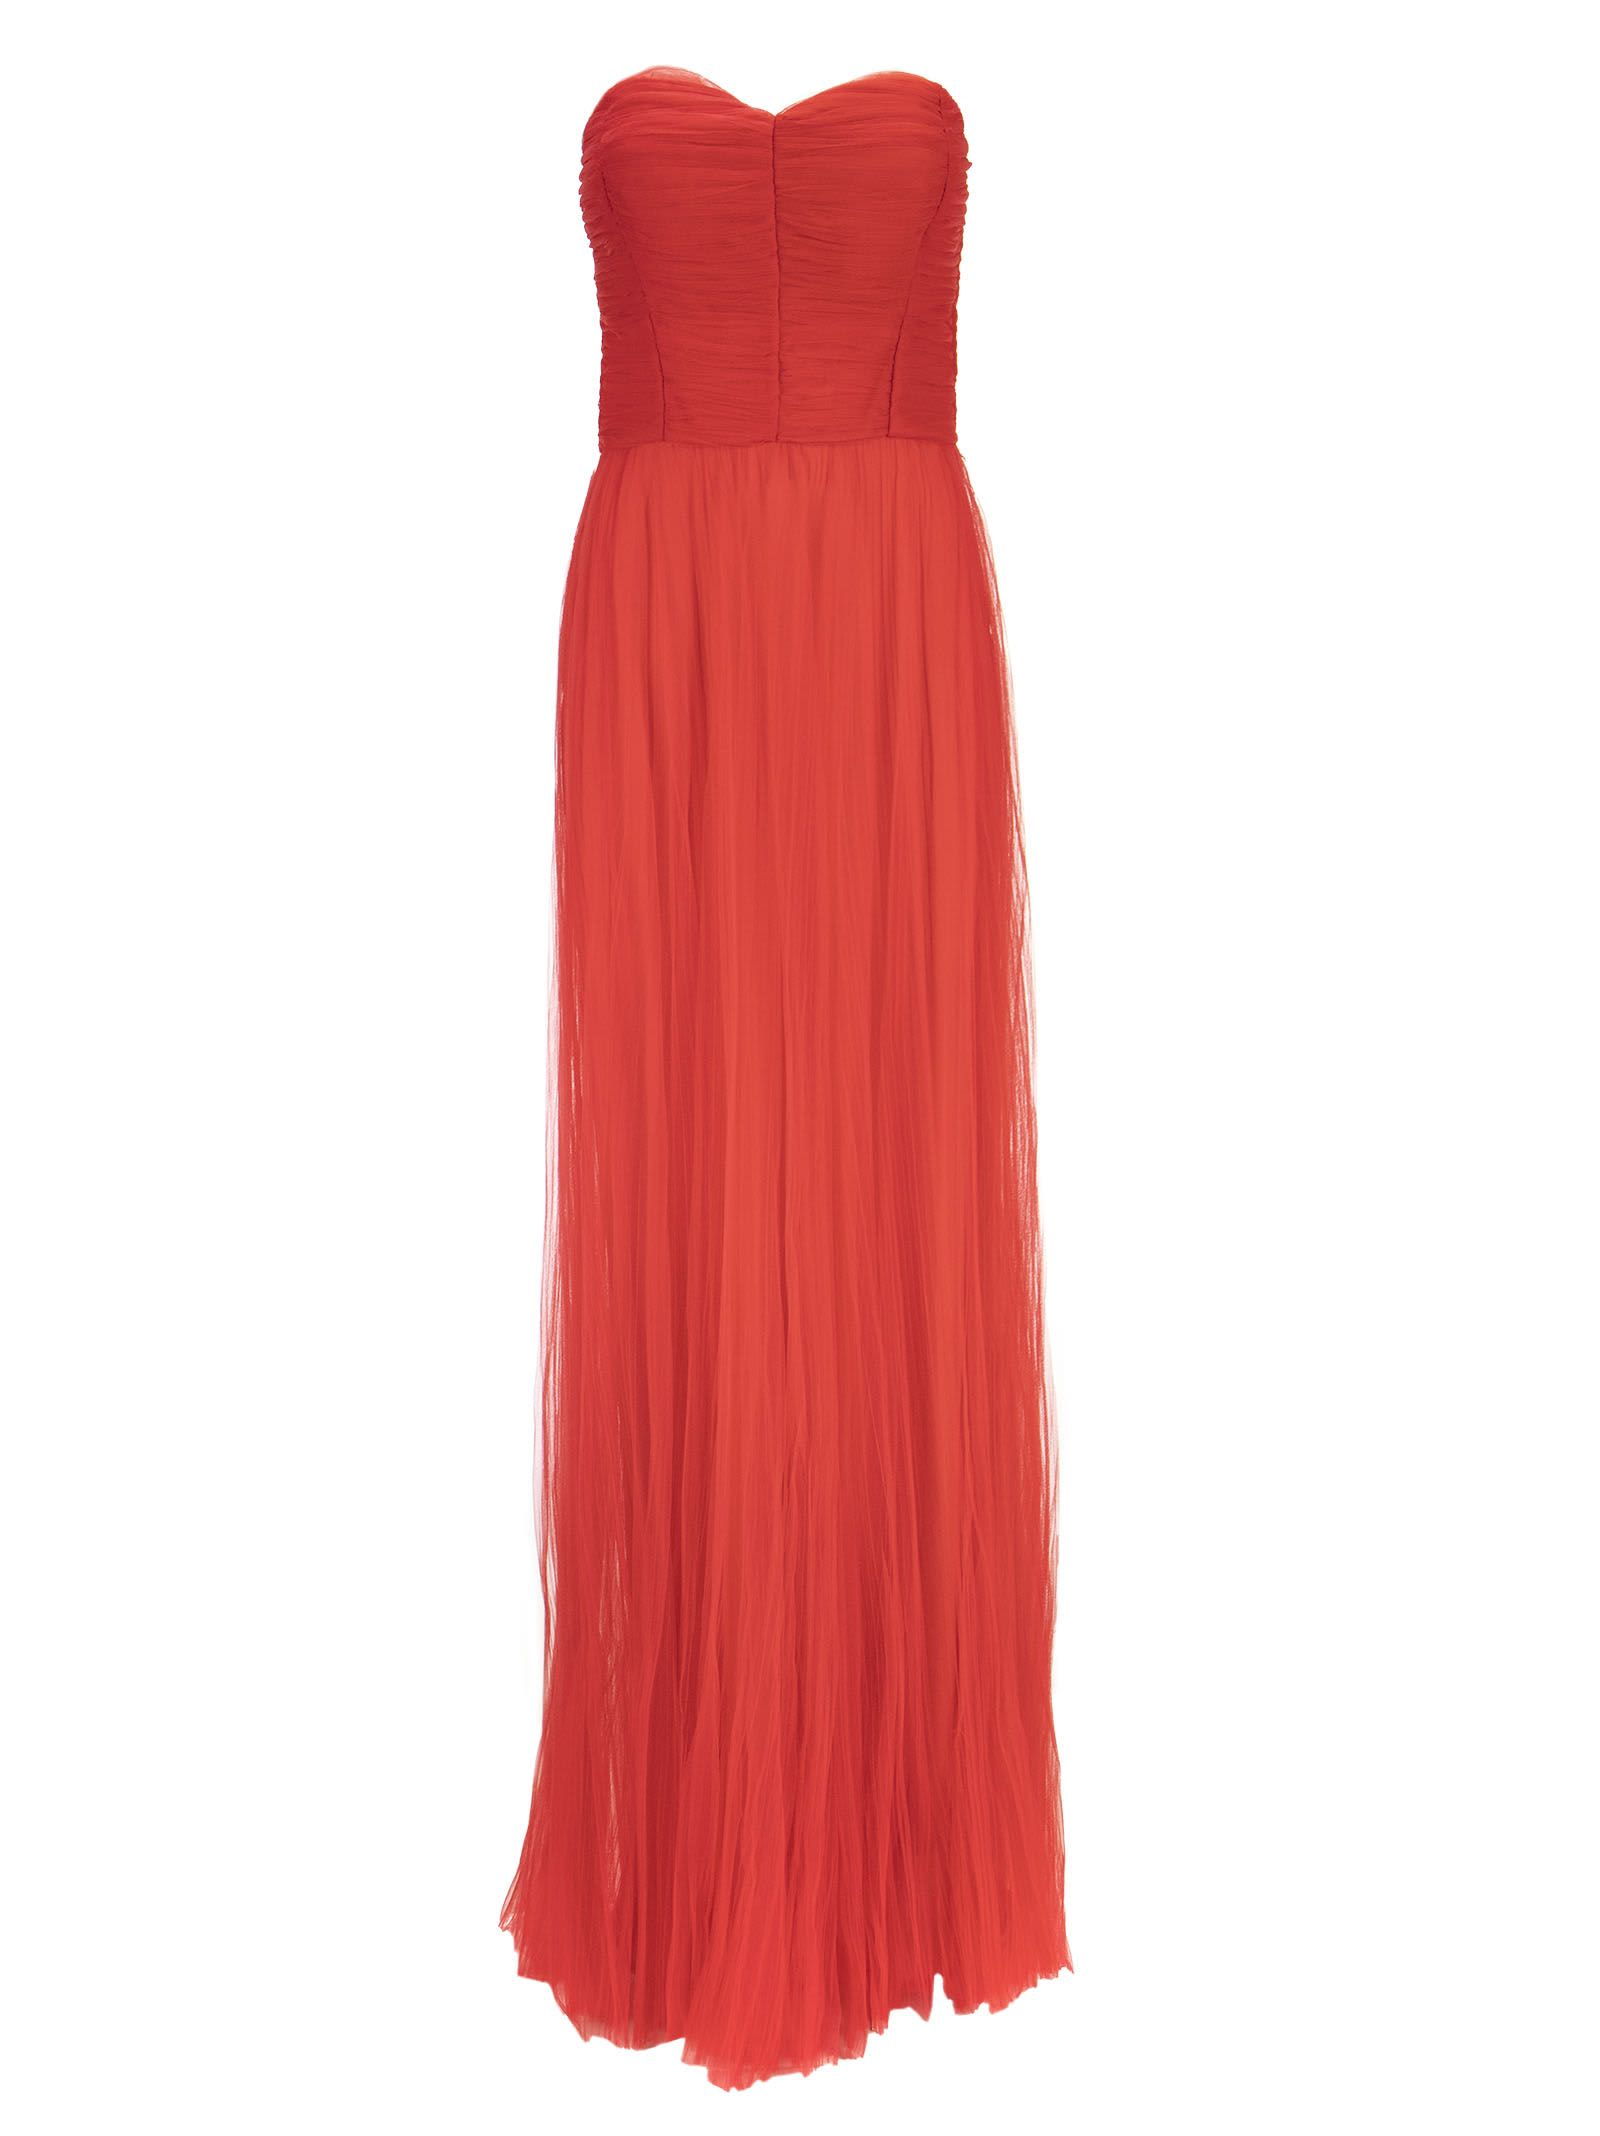 Elisabetta Franchi Red Carpet Dress In Tulle Fabric